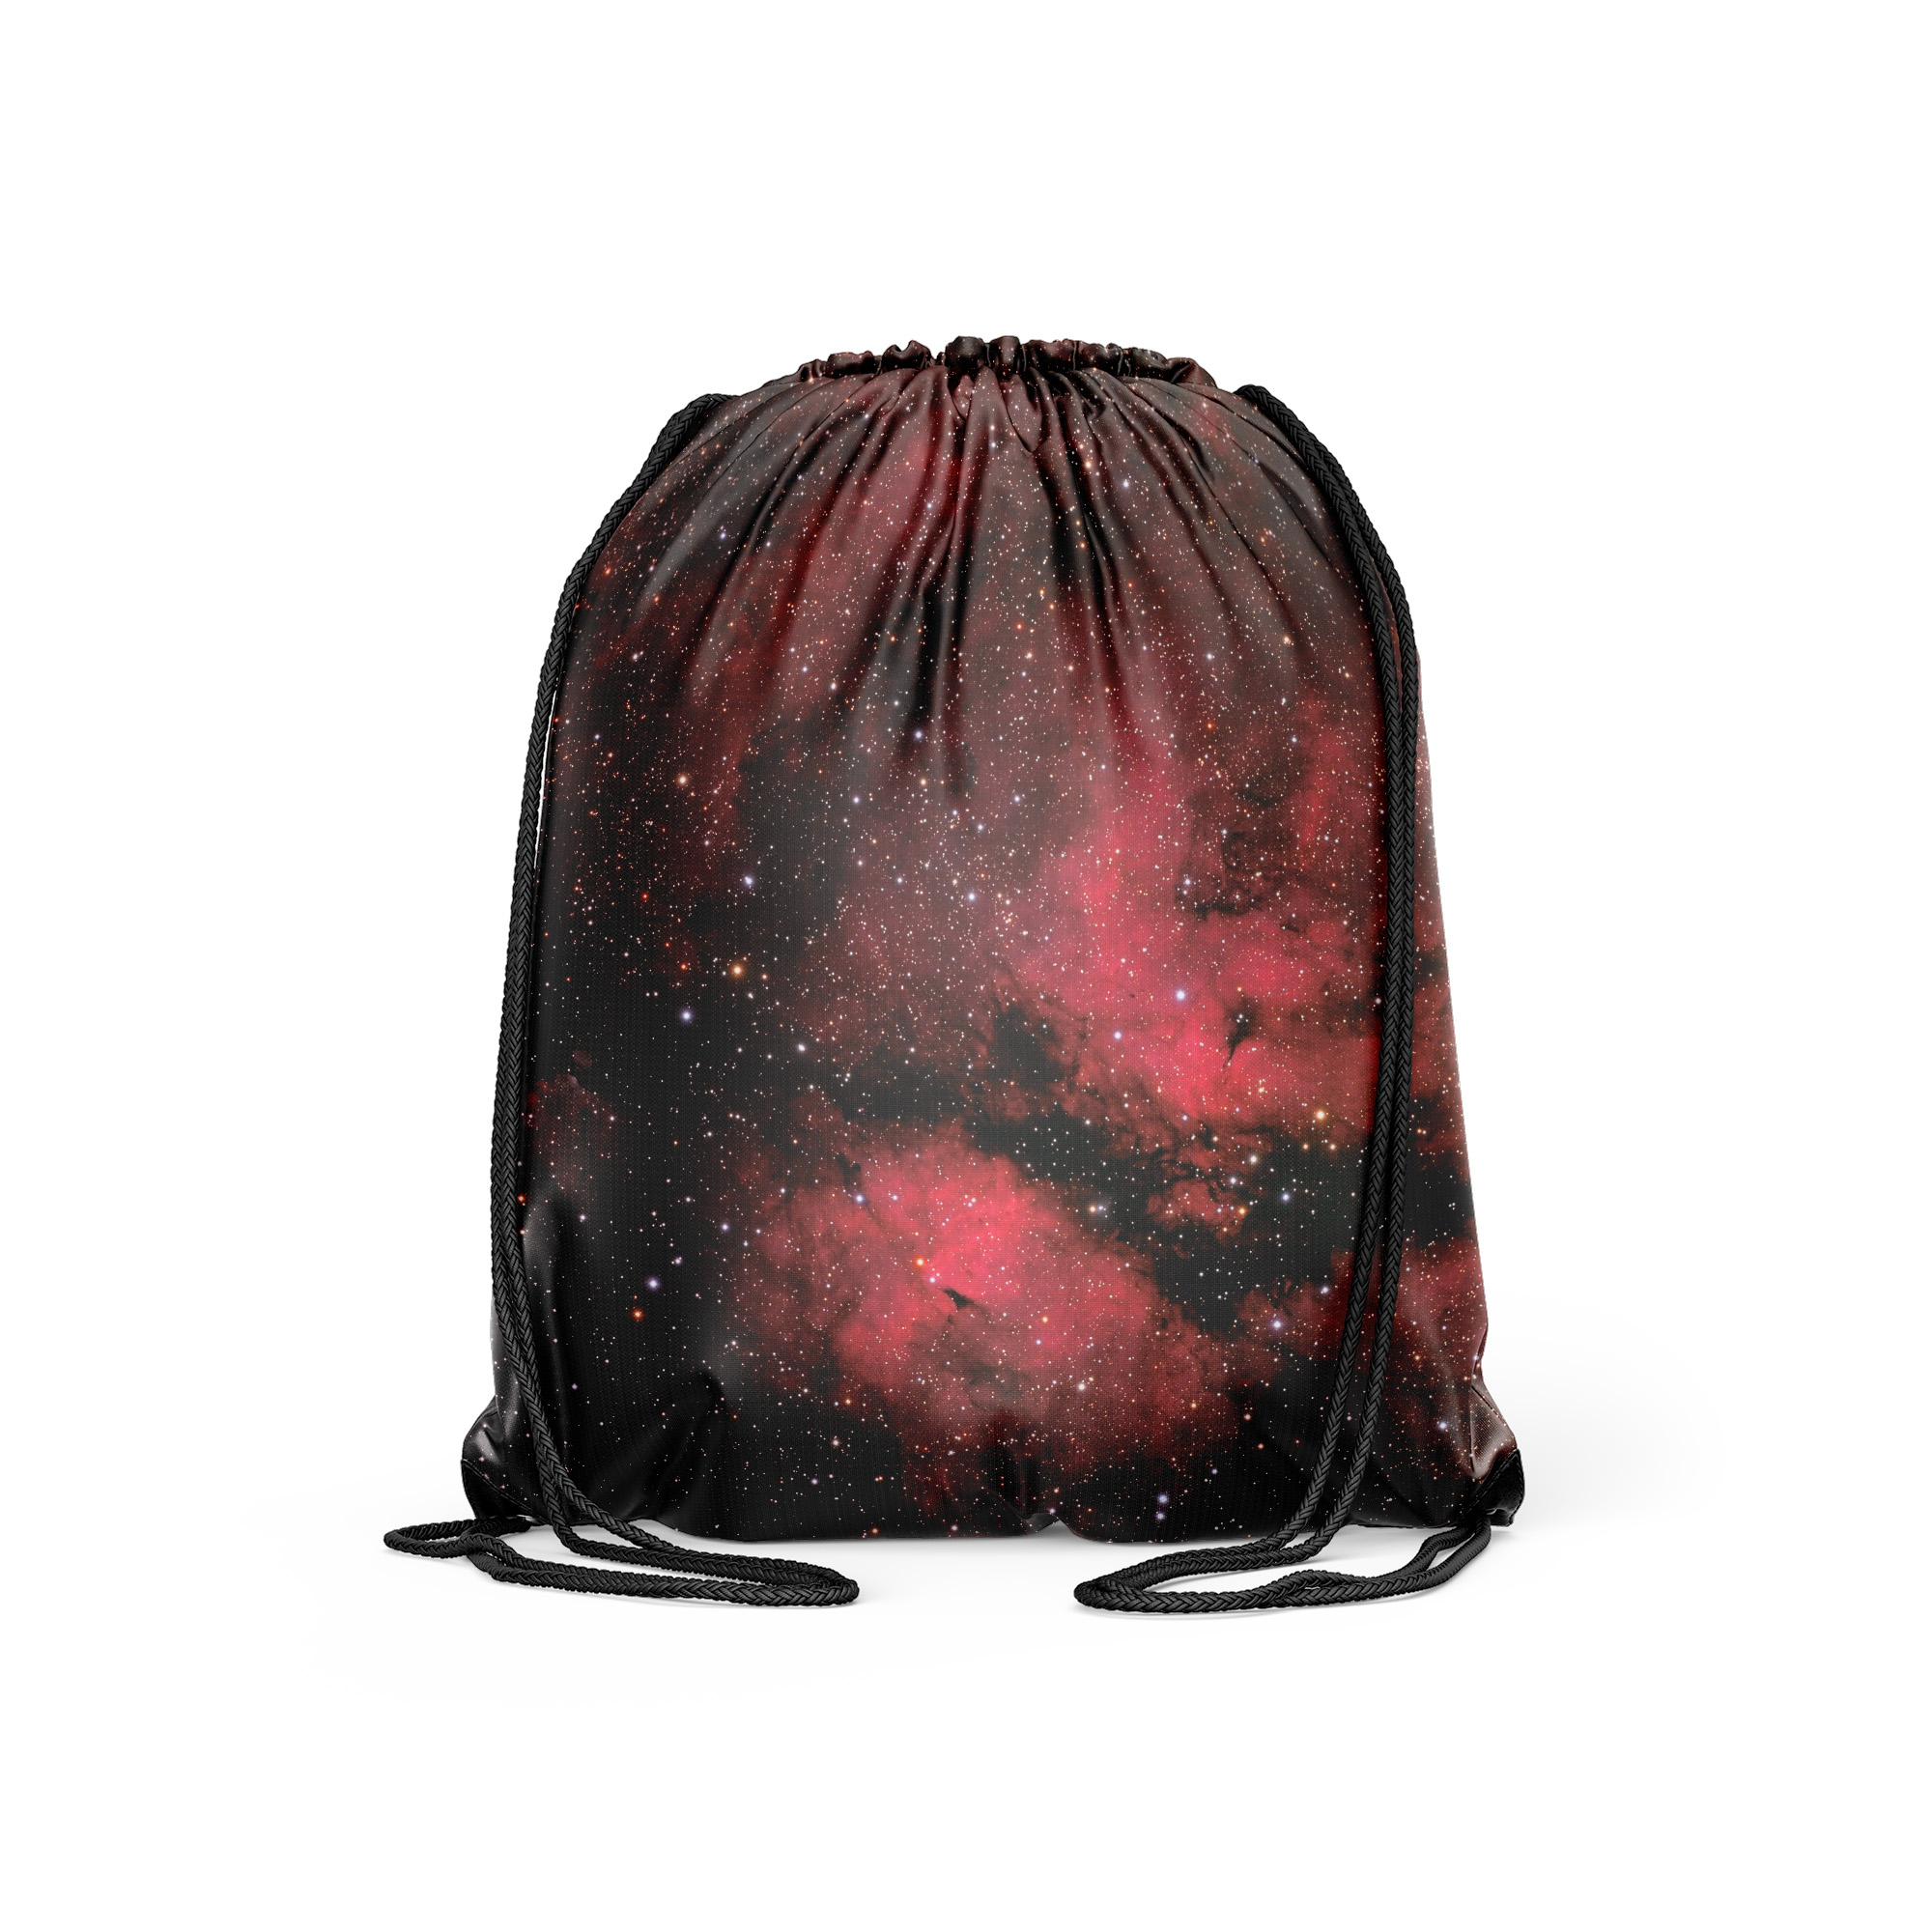 Astro Backpack Sadr Region